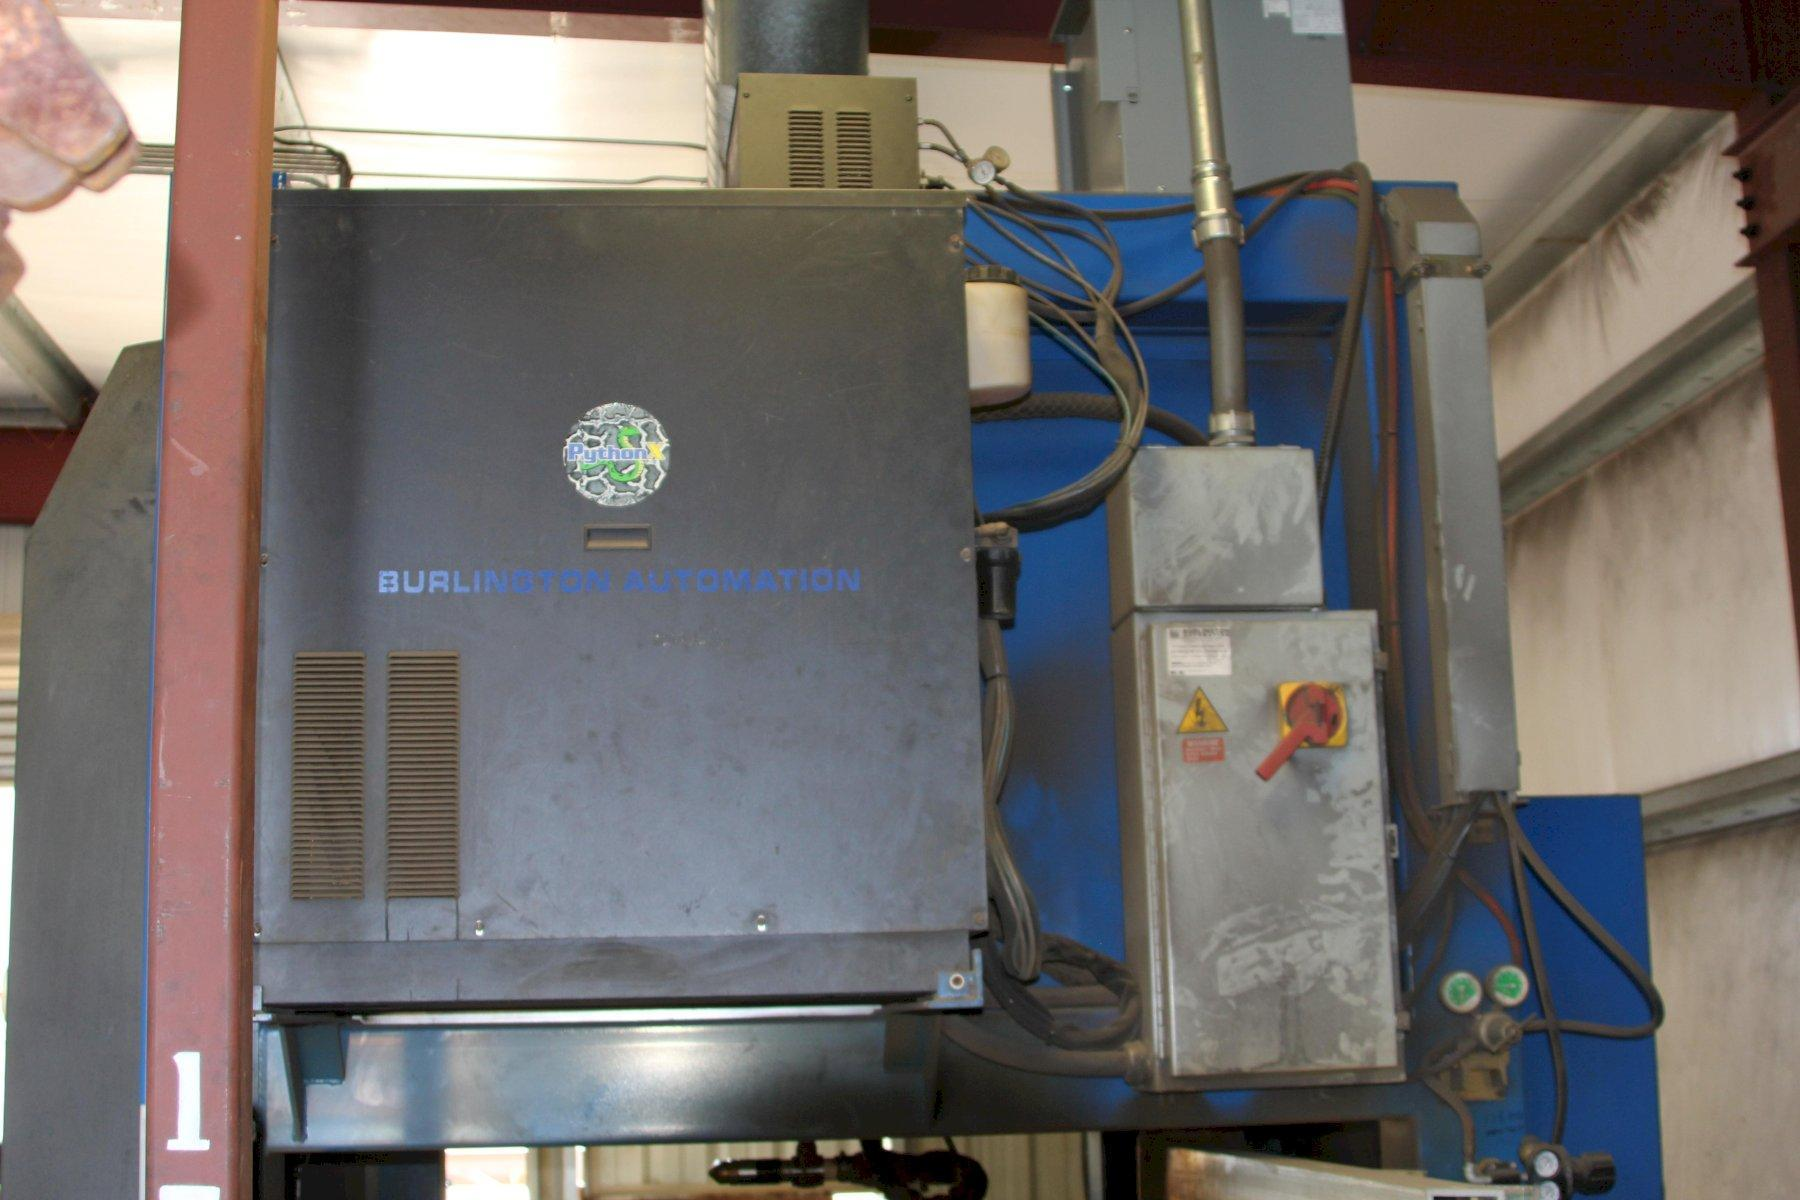 2010 BURLINGTON AUTOMATION PYTHON MODEL XS PLASMA CNC STRUCTURAL CUTTING SYSTEM: STOCK 14430